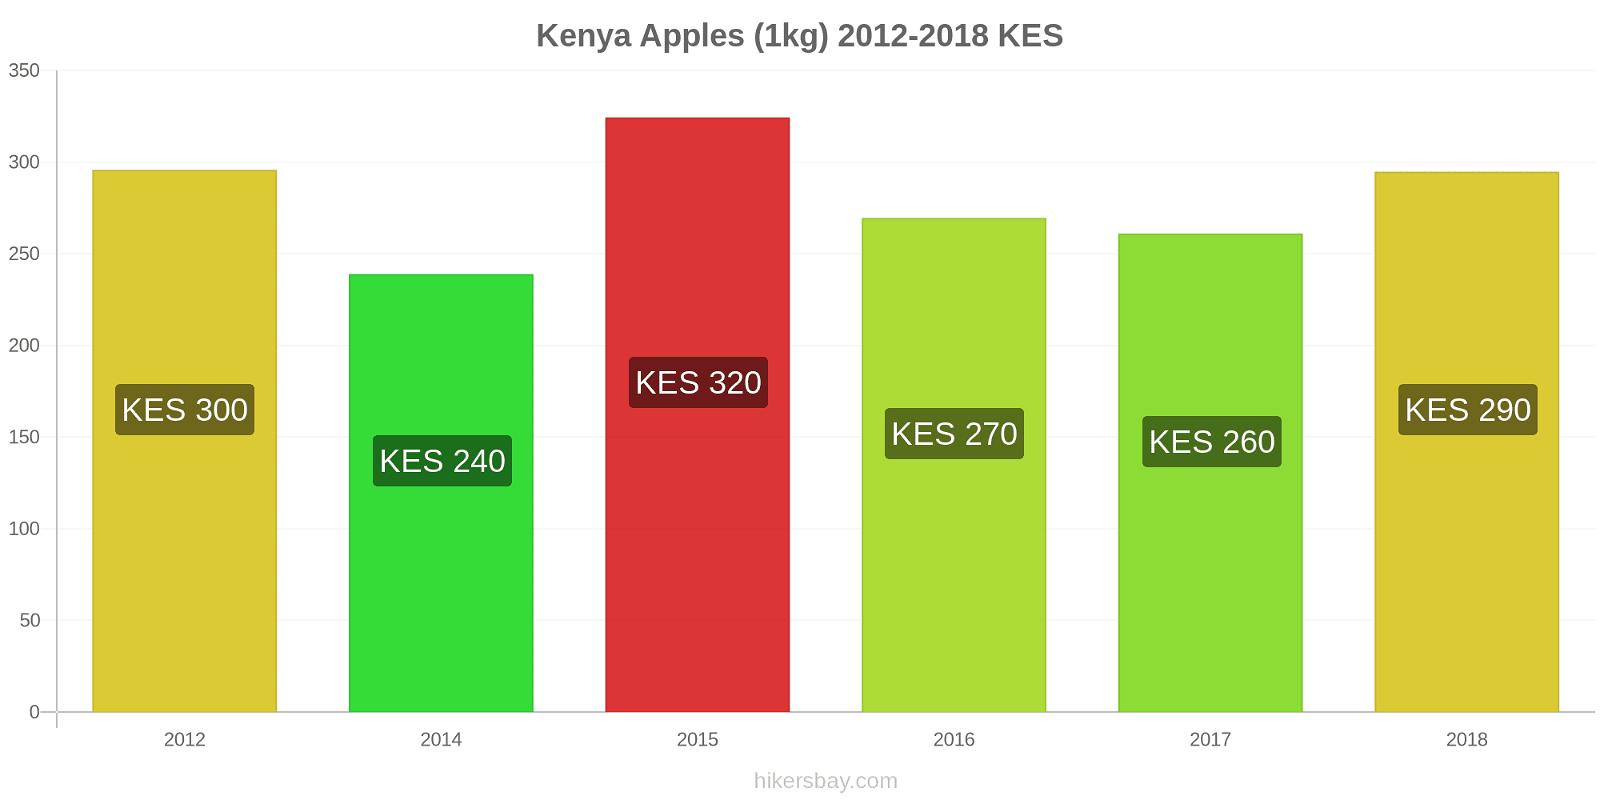 Kenya price changes Apples (1kg) hikersbay.com